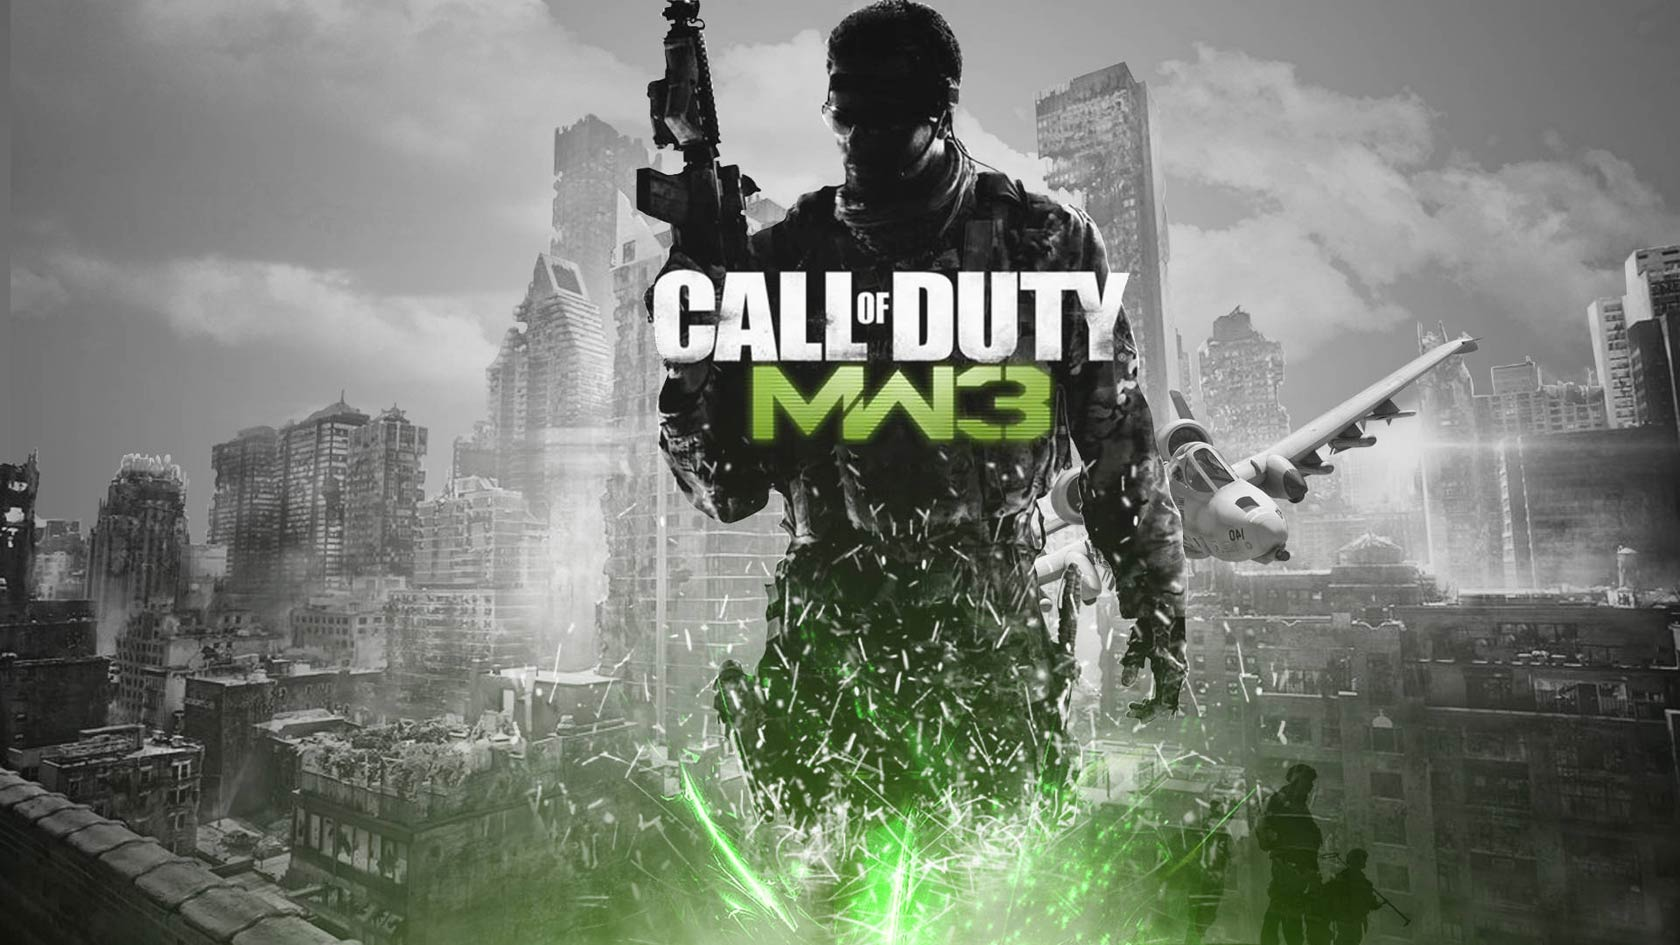 Call of duty mw3 zone folder download windows 7